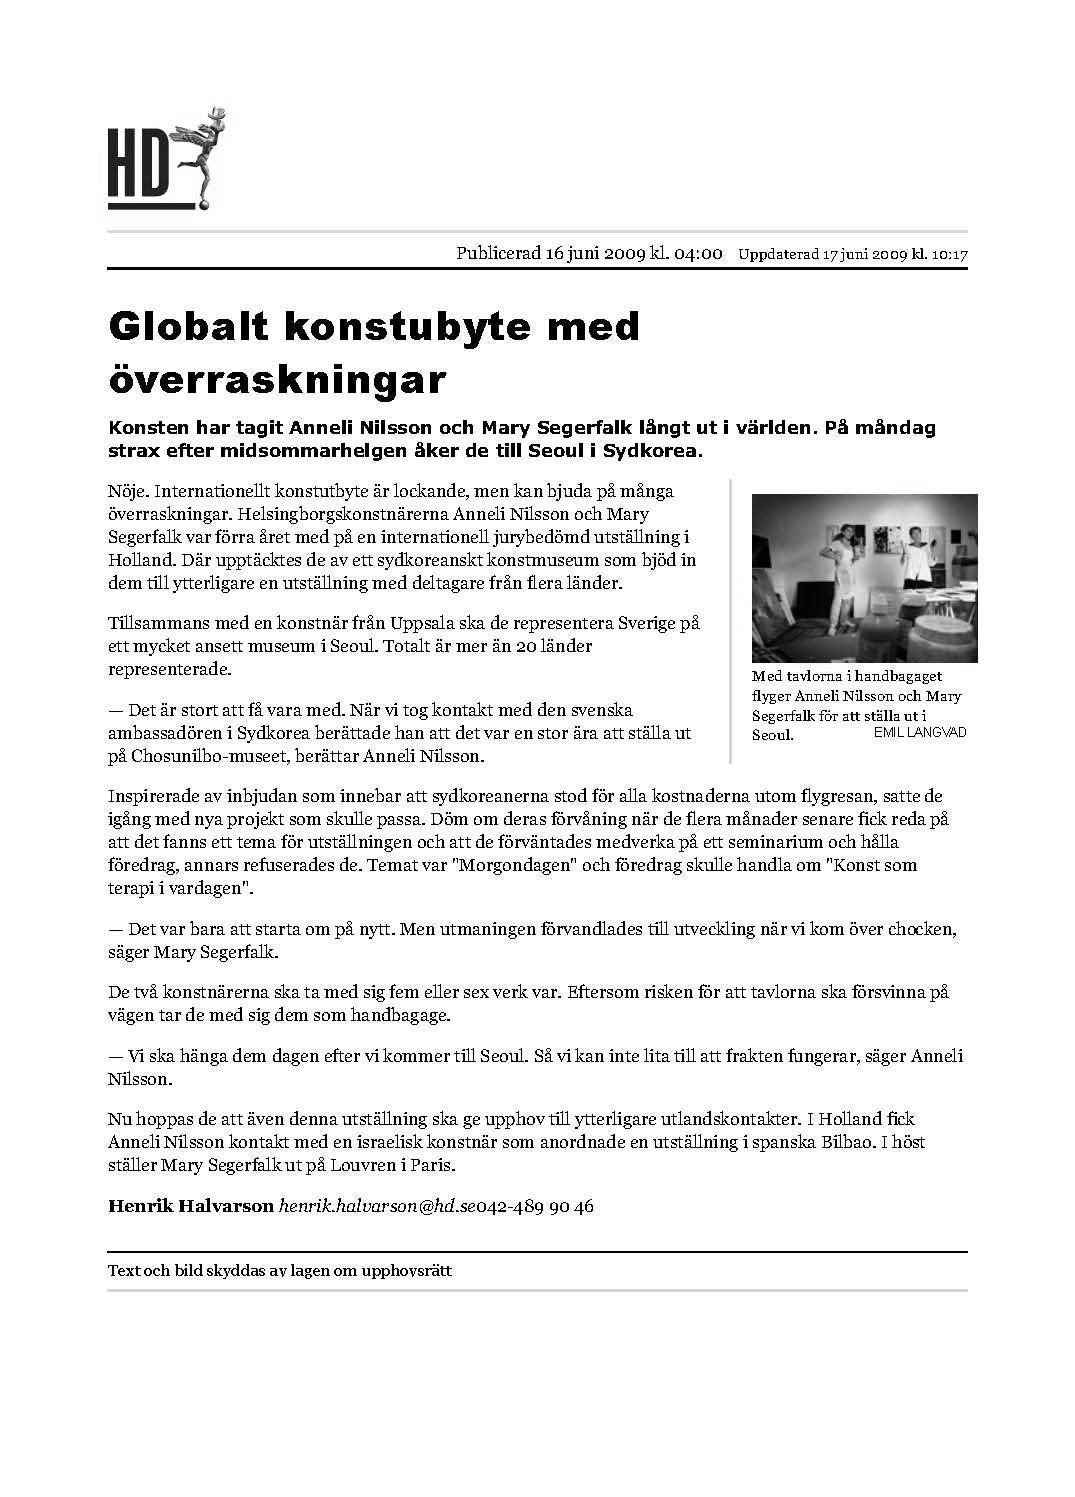 Globalt konstubyte med overraskningar - hd.se.jpg